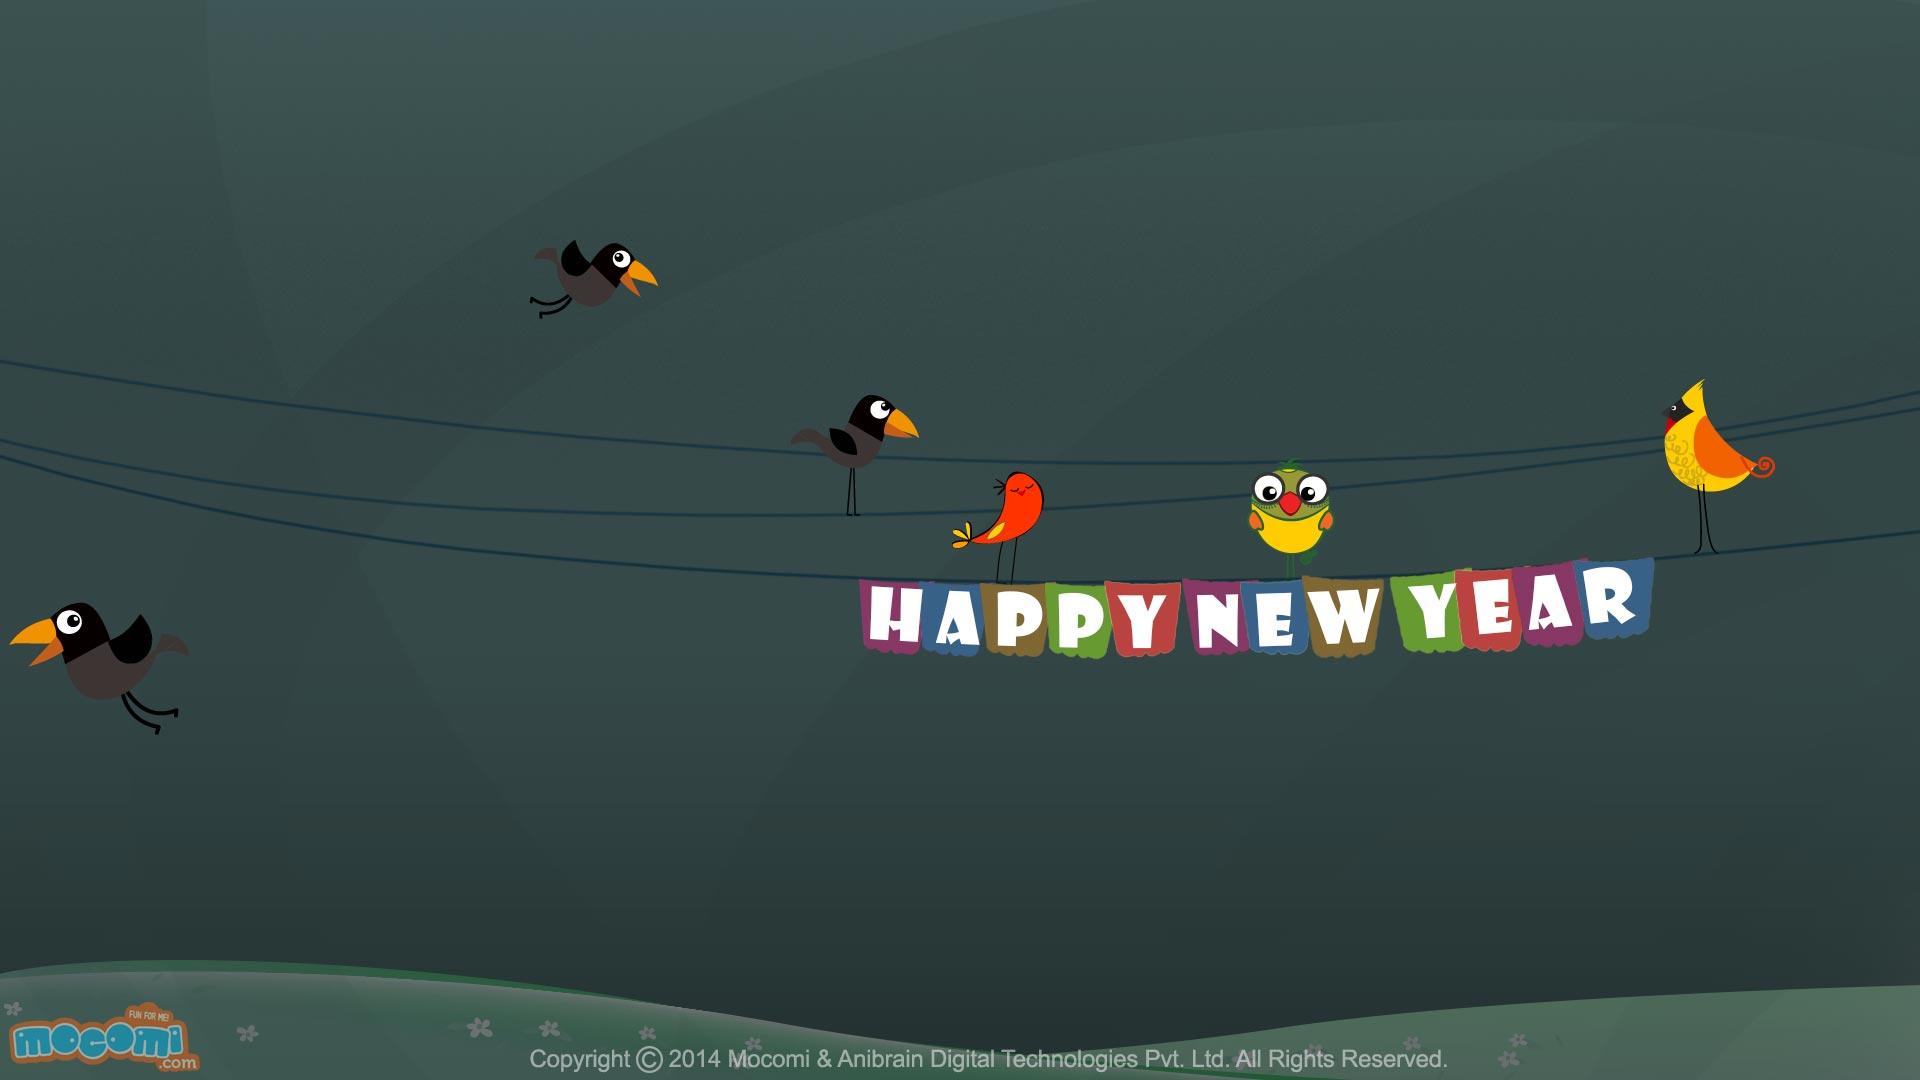 Happy New Year Wallpaper- 1